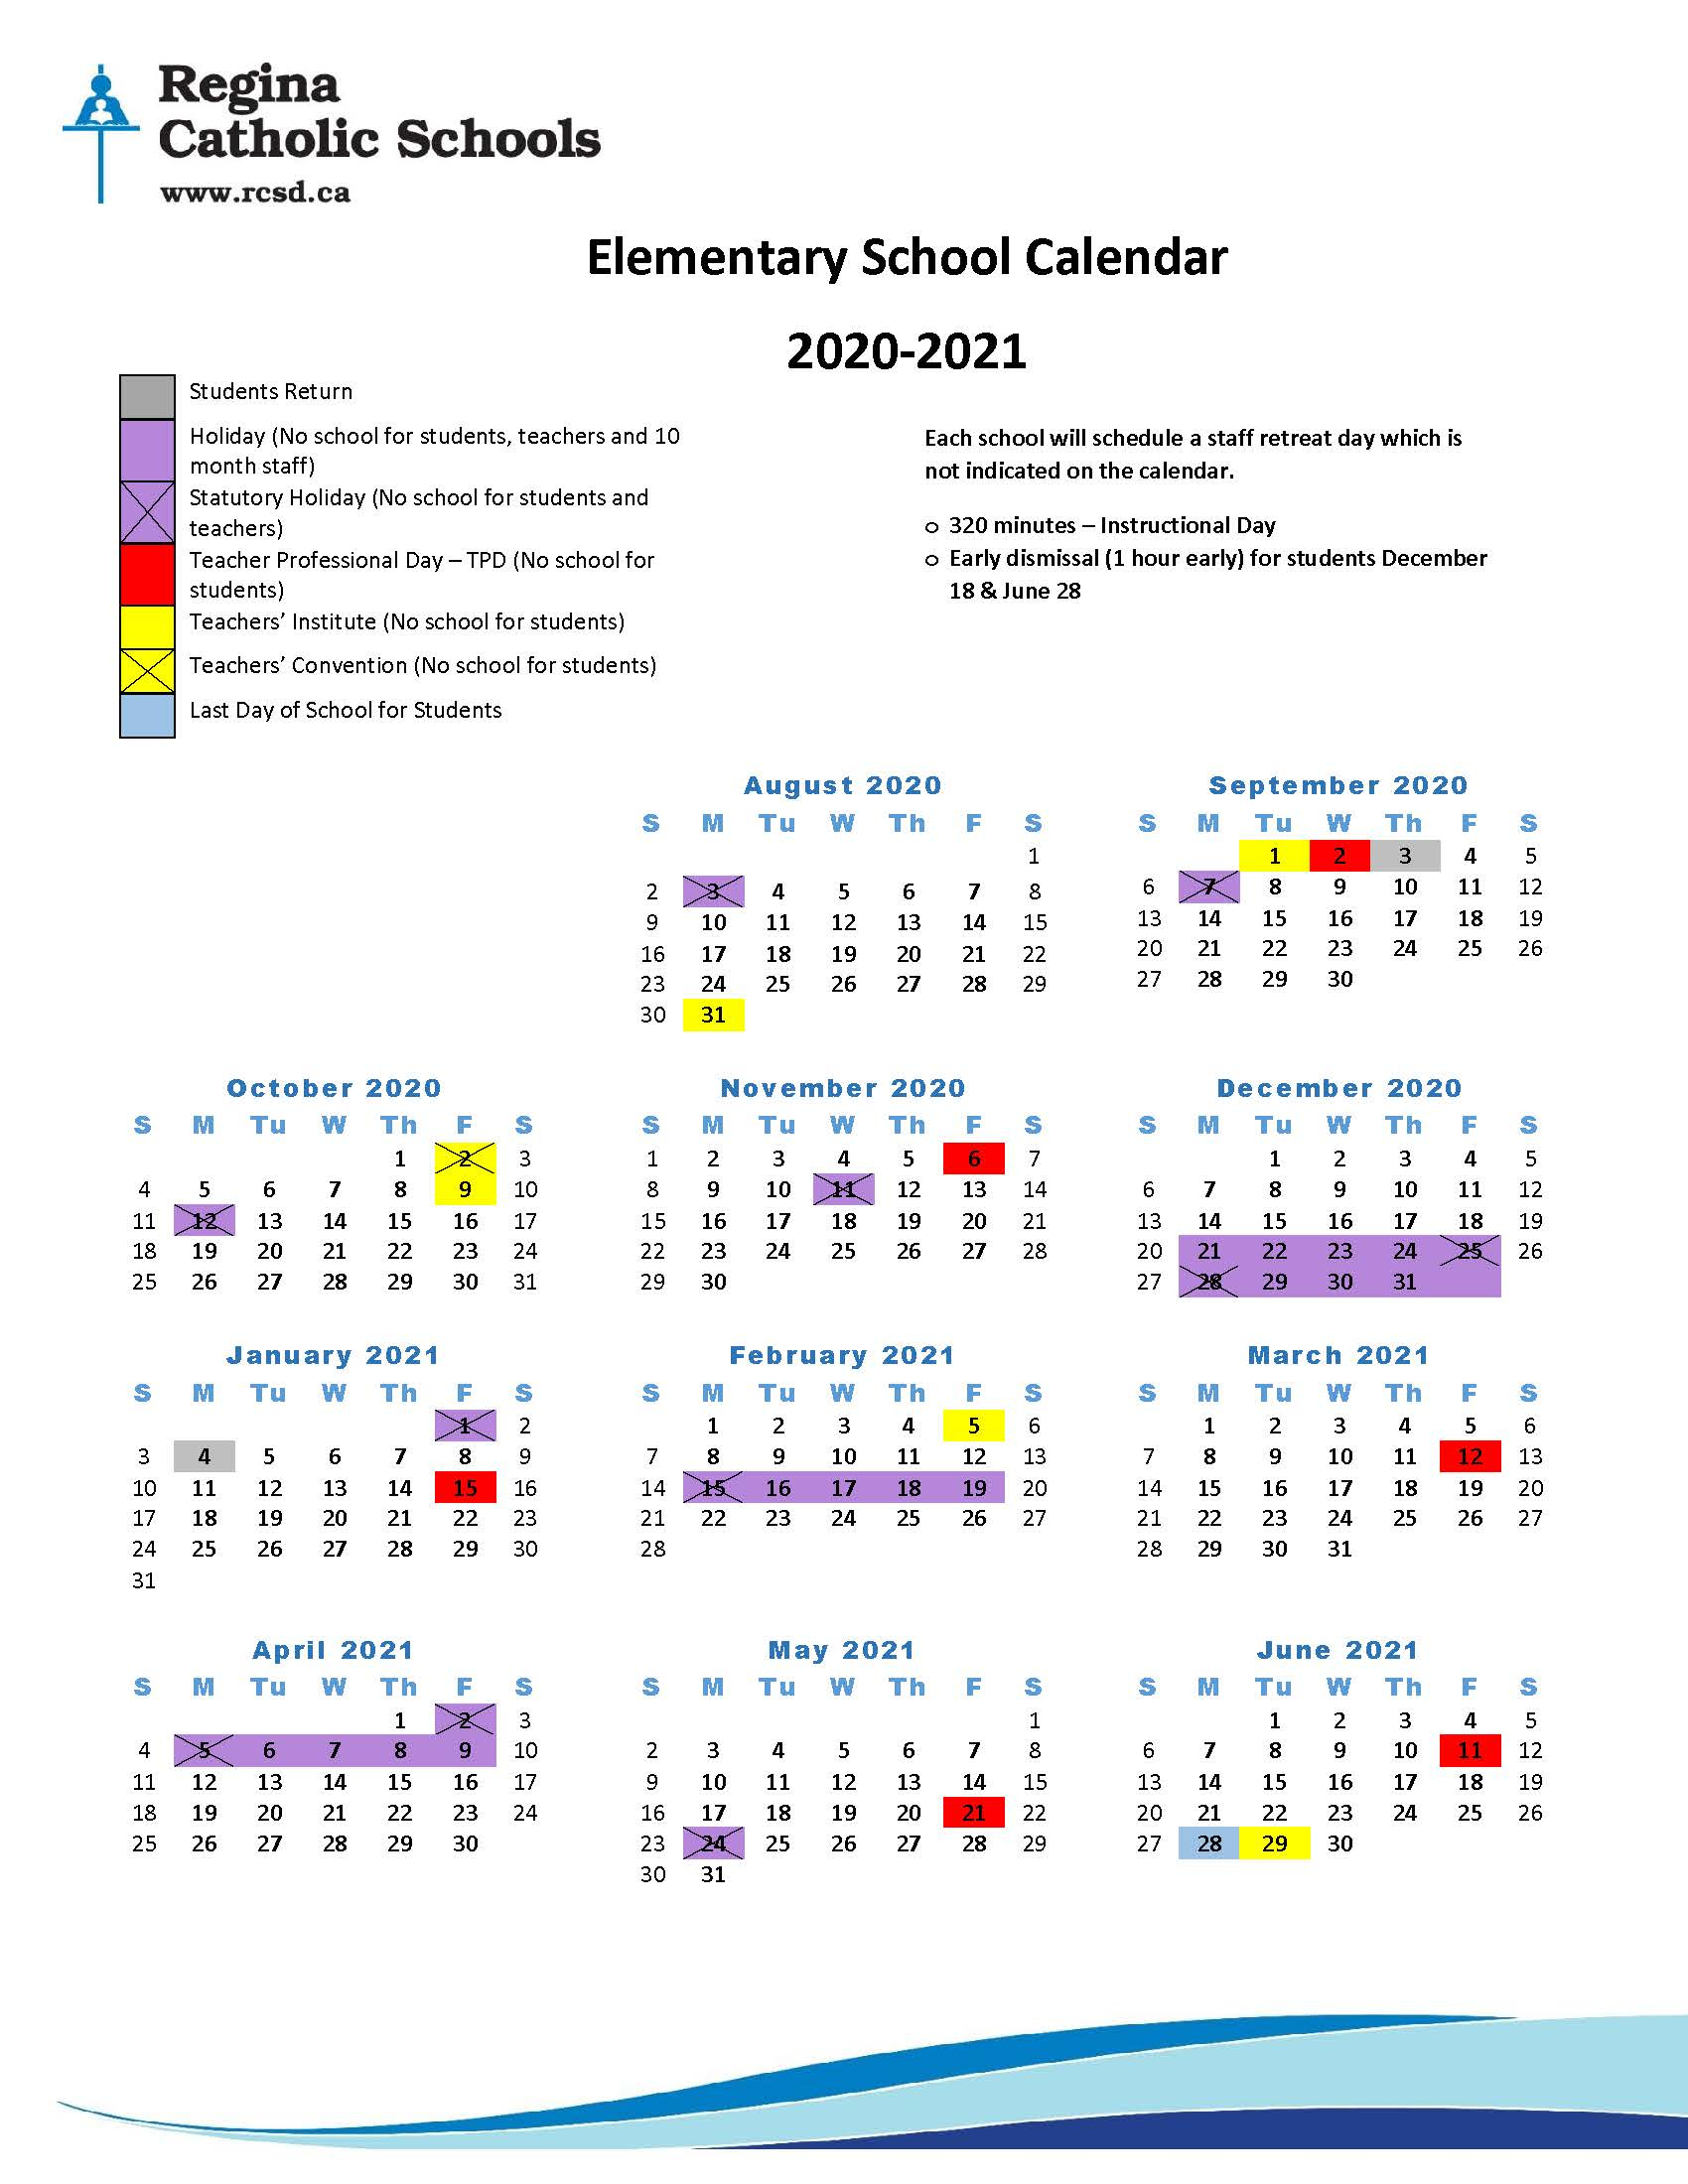 St. Theresa School – St. Theresa School In Jersey City Public School Calendar 2021 2020